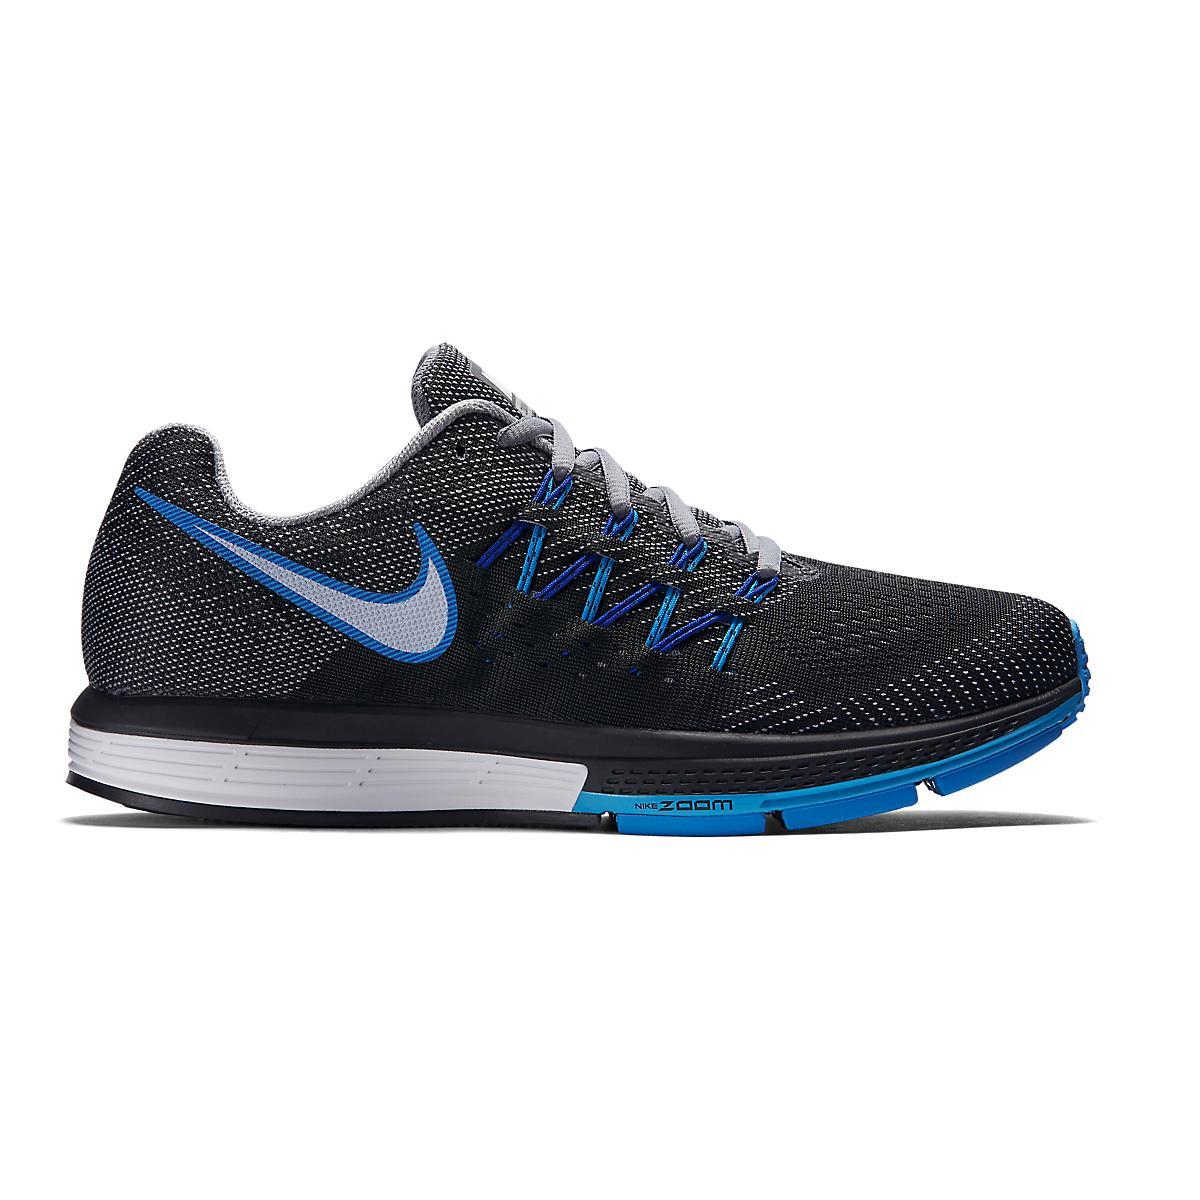 ff78df5b141 Men s Nike Air Zoom Vomero-10 at Road Runner Sports